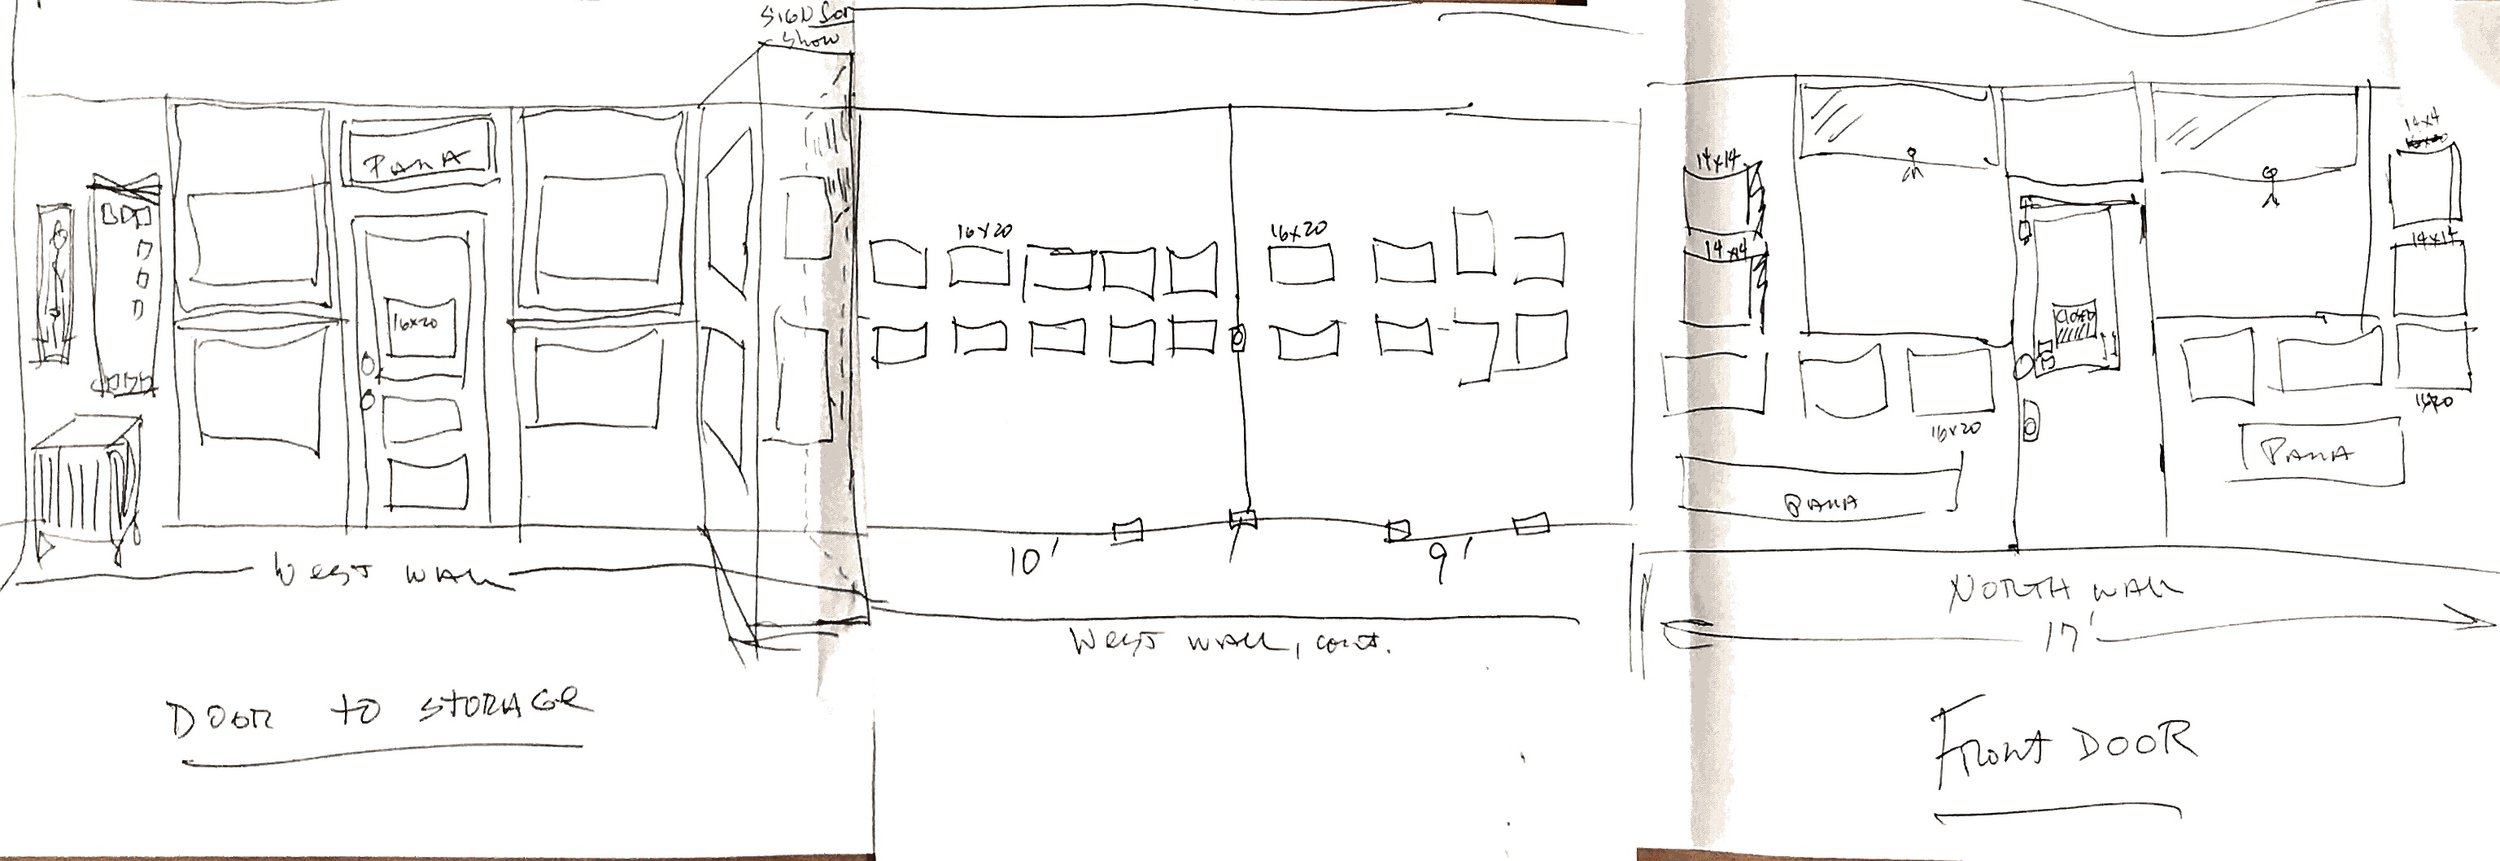 Ward Russel gallery sketch 1